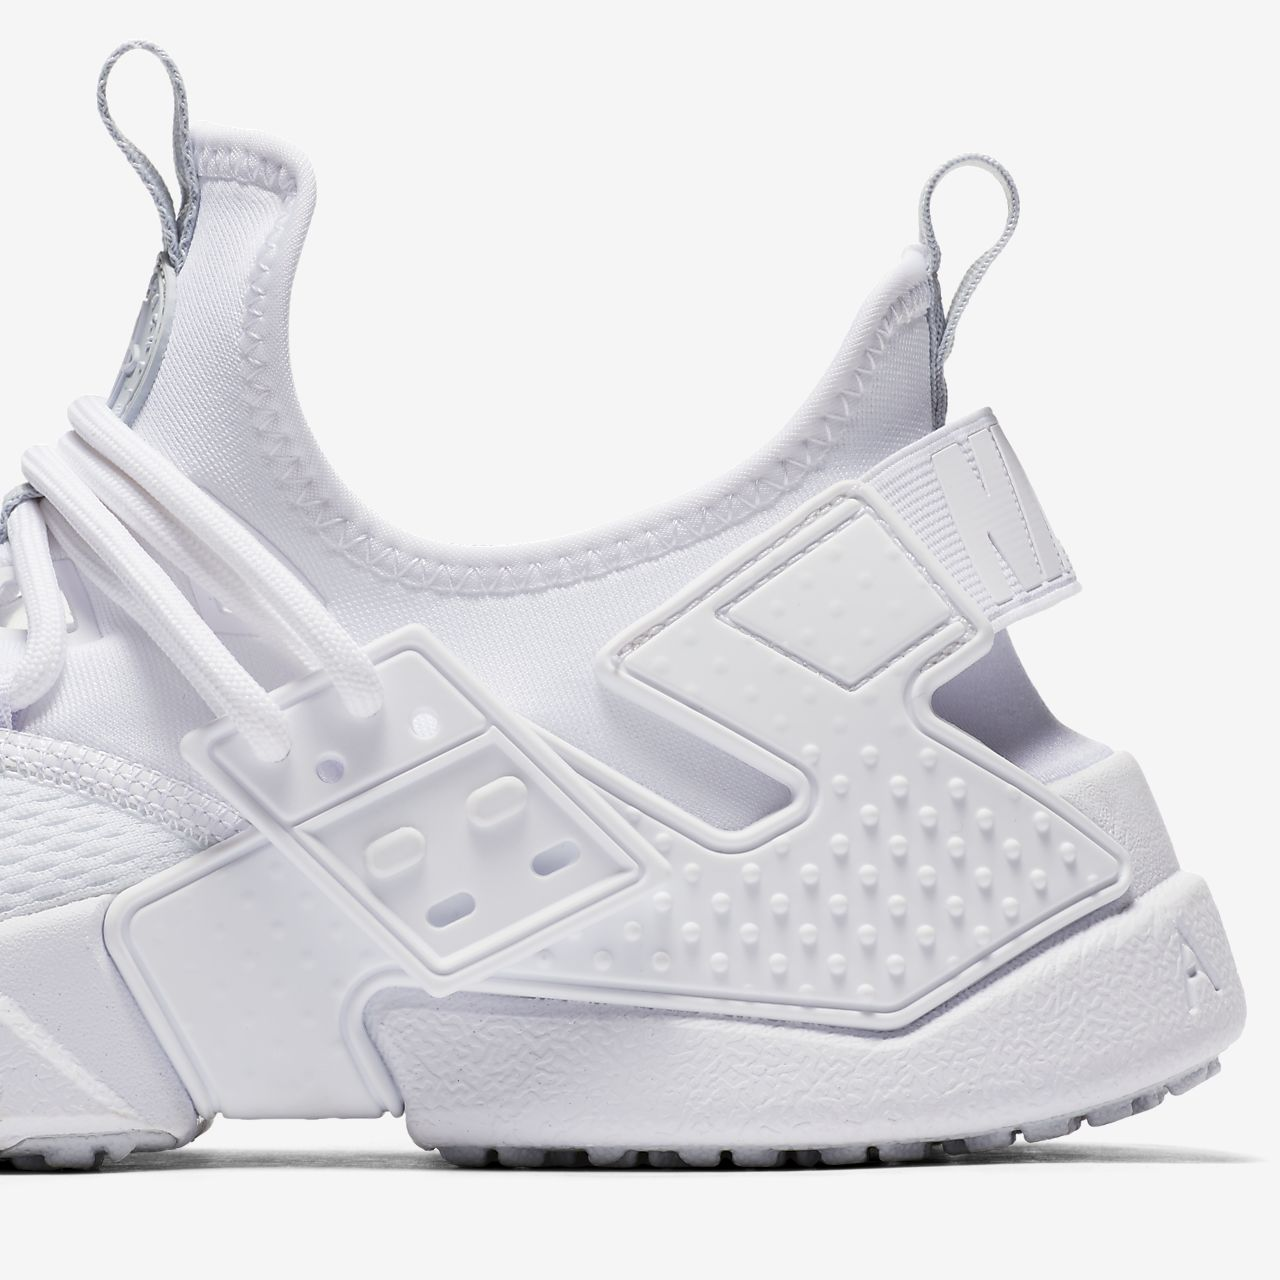 Nike Air Huarache Drift Breathe White Platinum